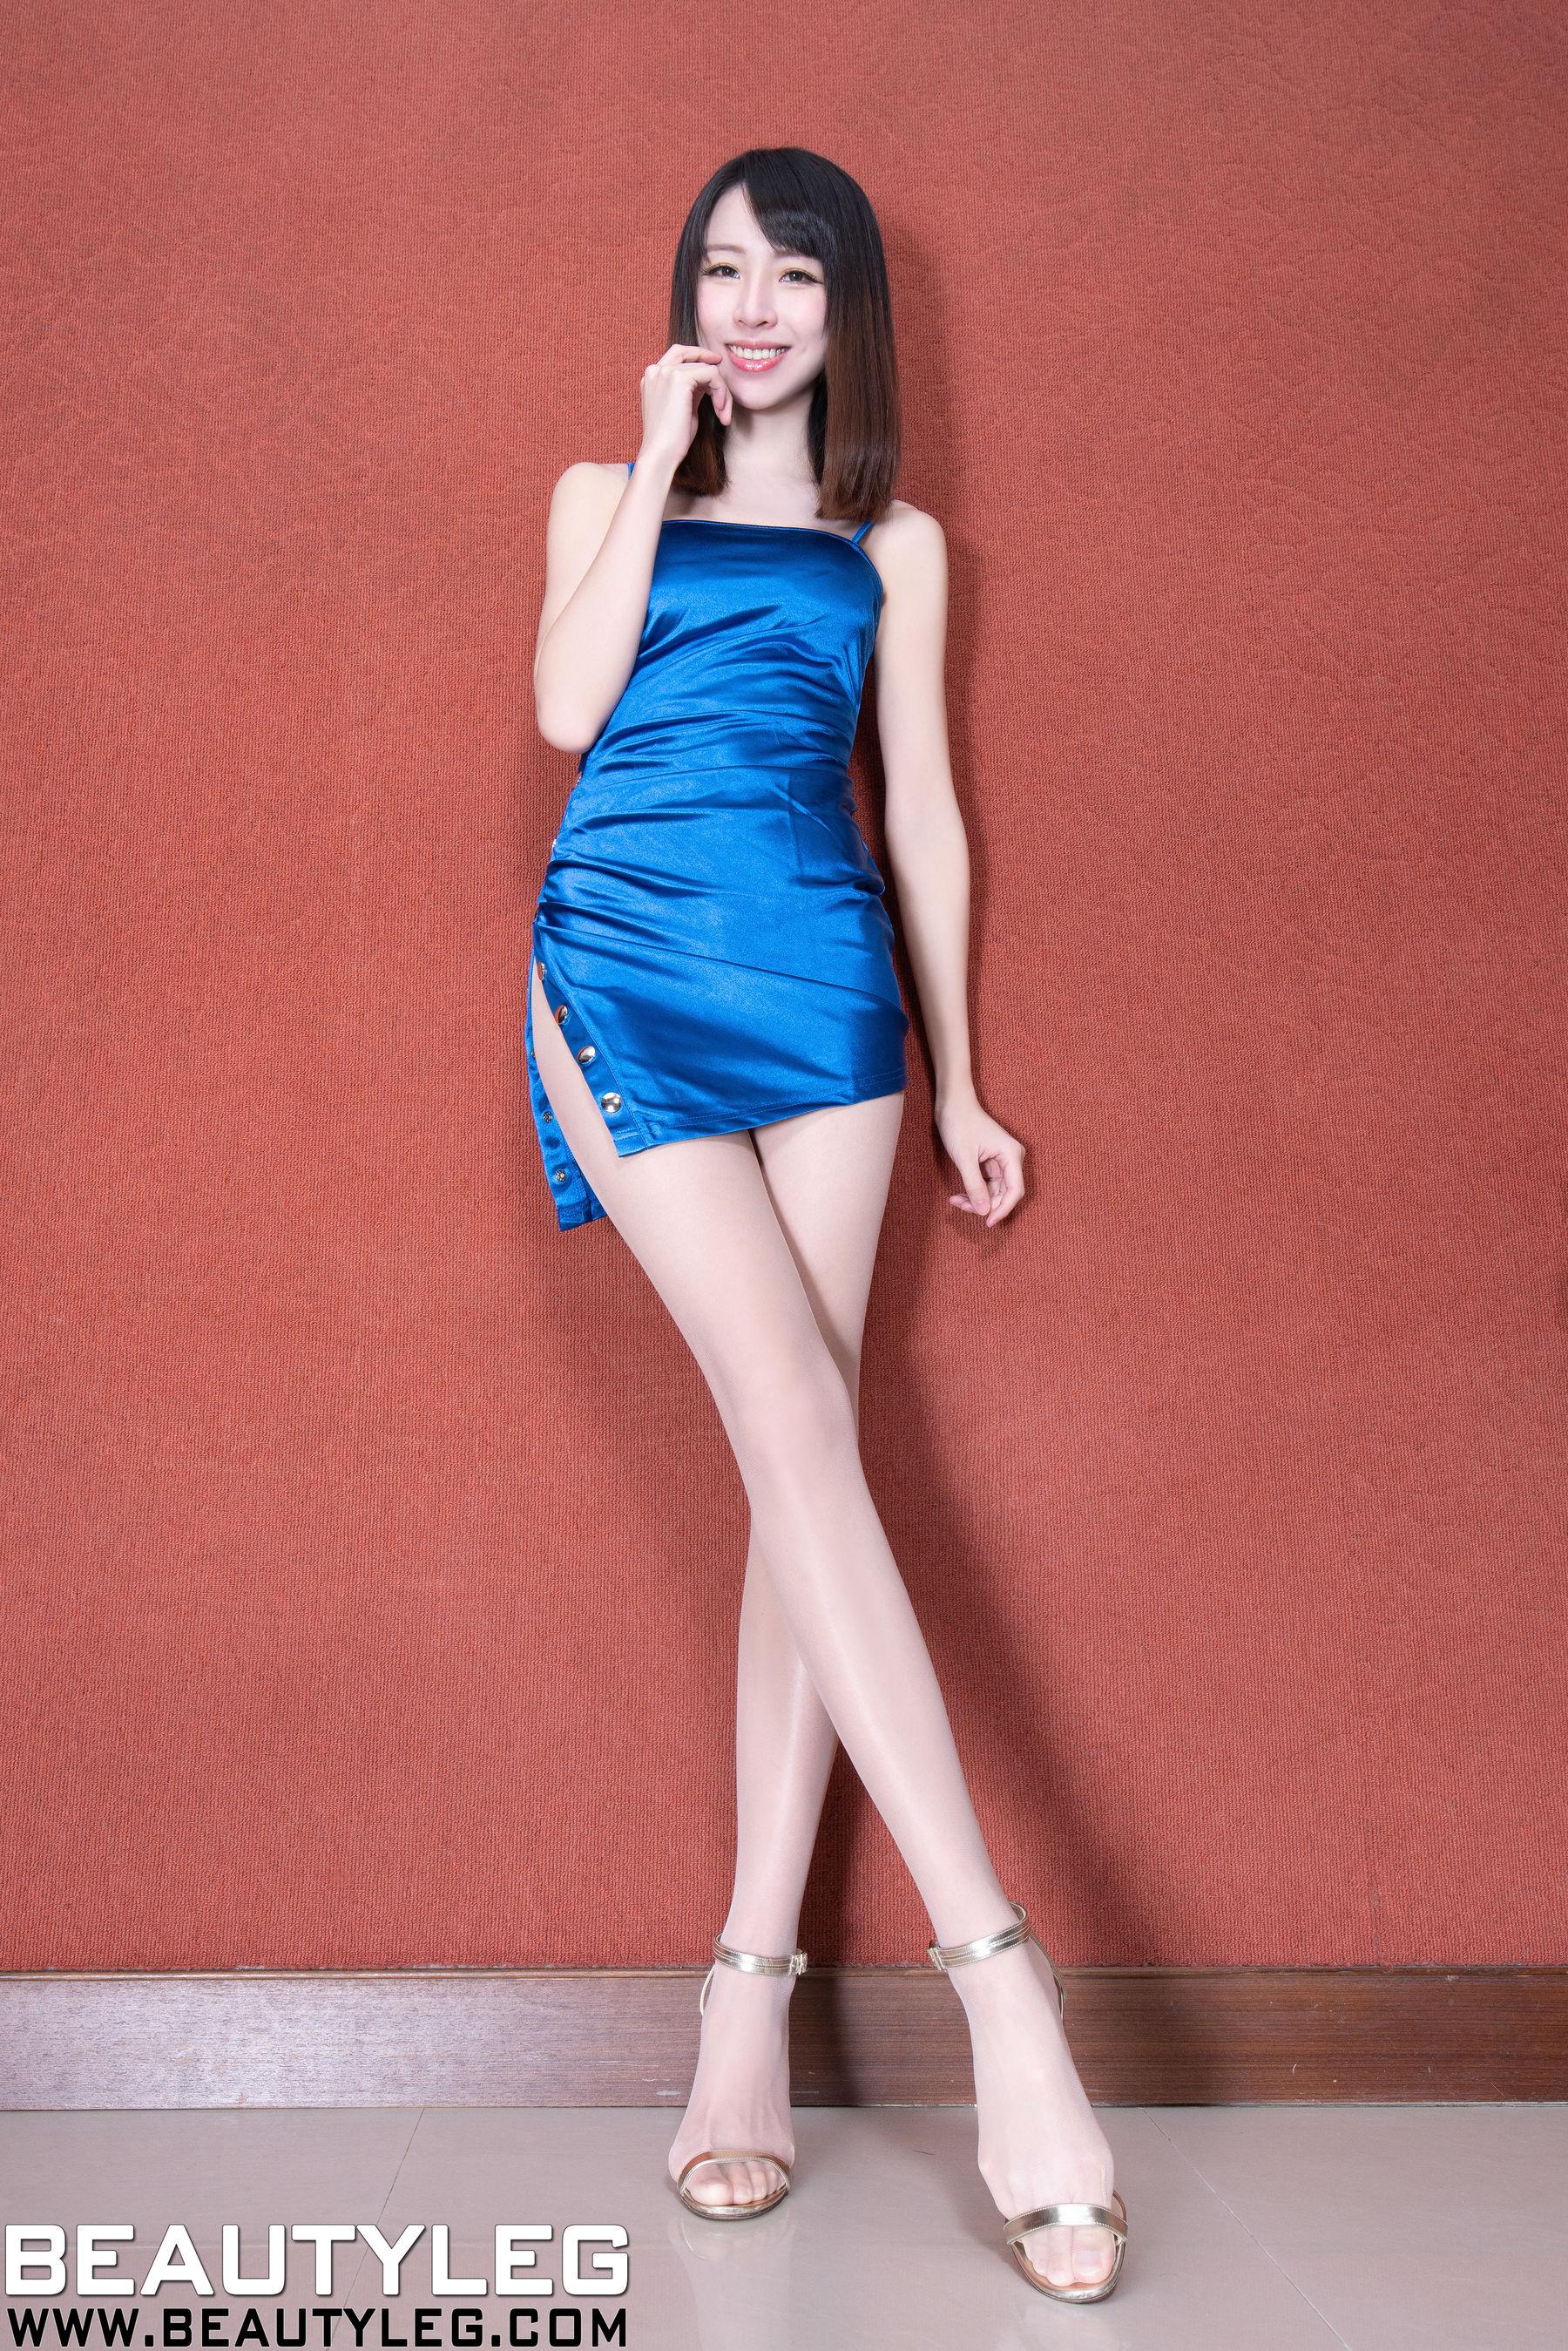 VOL.403 [Beautyleg]旗袍长腿美女肉丝美腿:腿模Nancy(Nancy)超高清个人性感漂亮大图(54P)